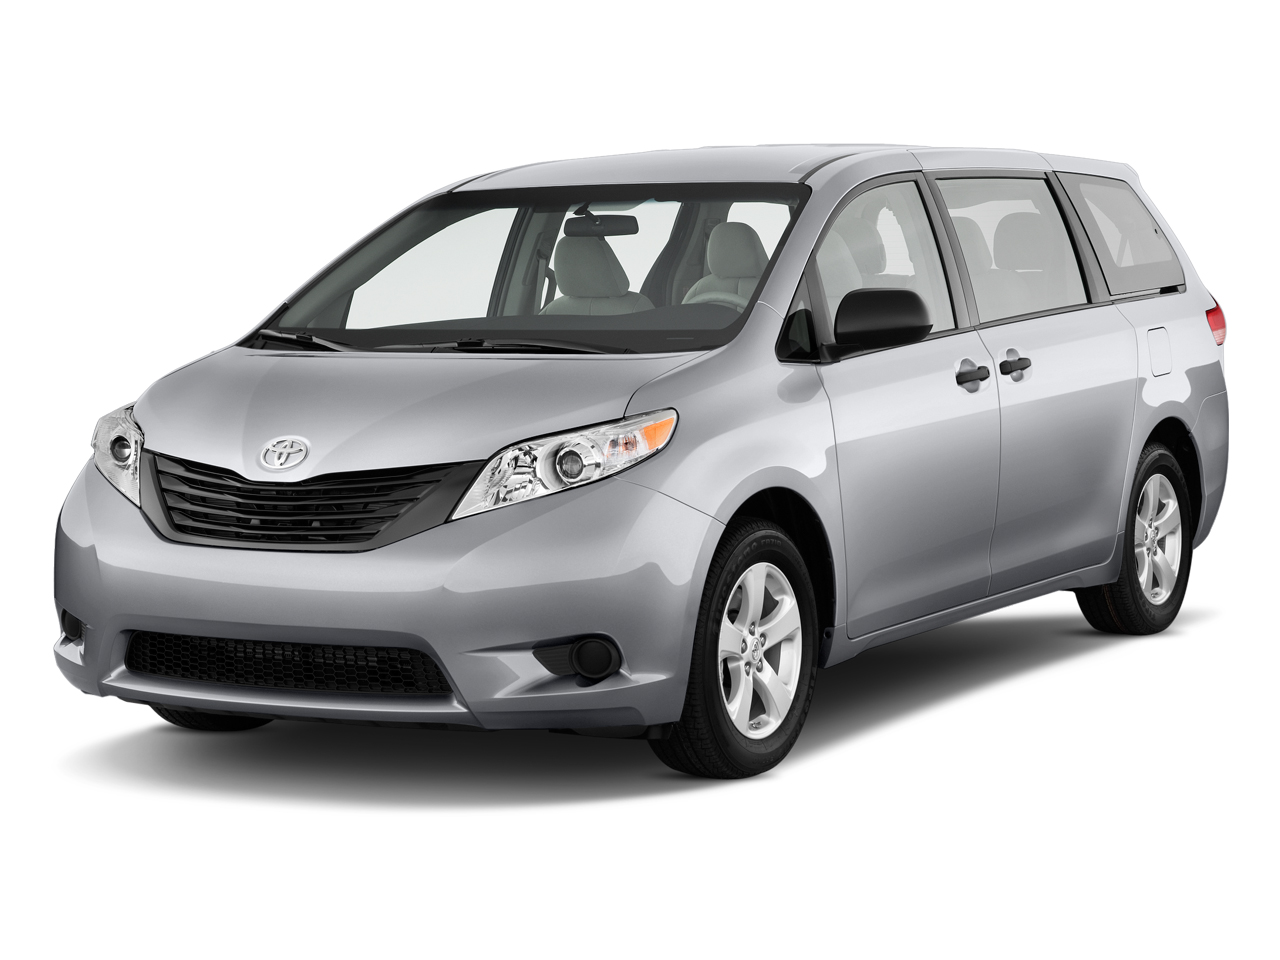 Kekurangan Toyota 2011 Perbandingan Harga